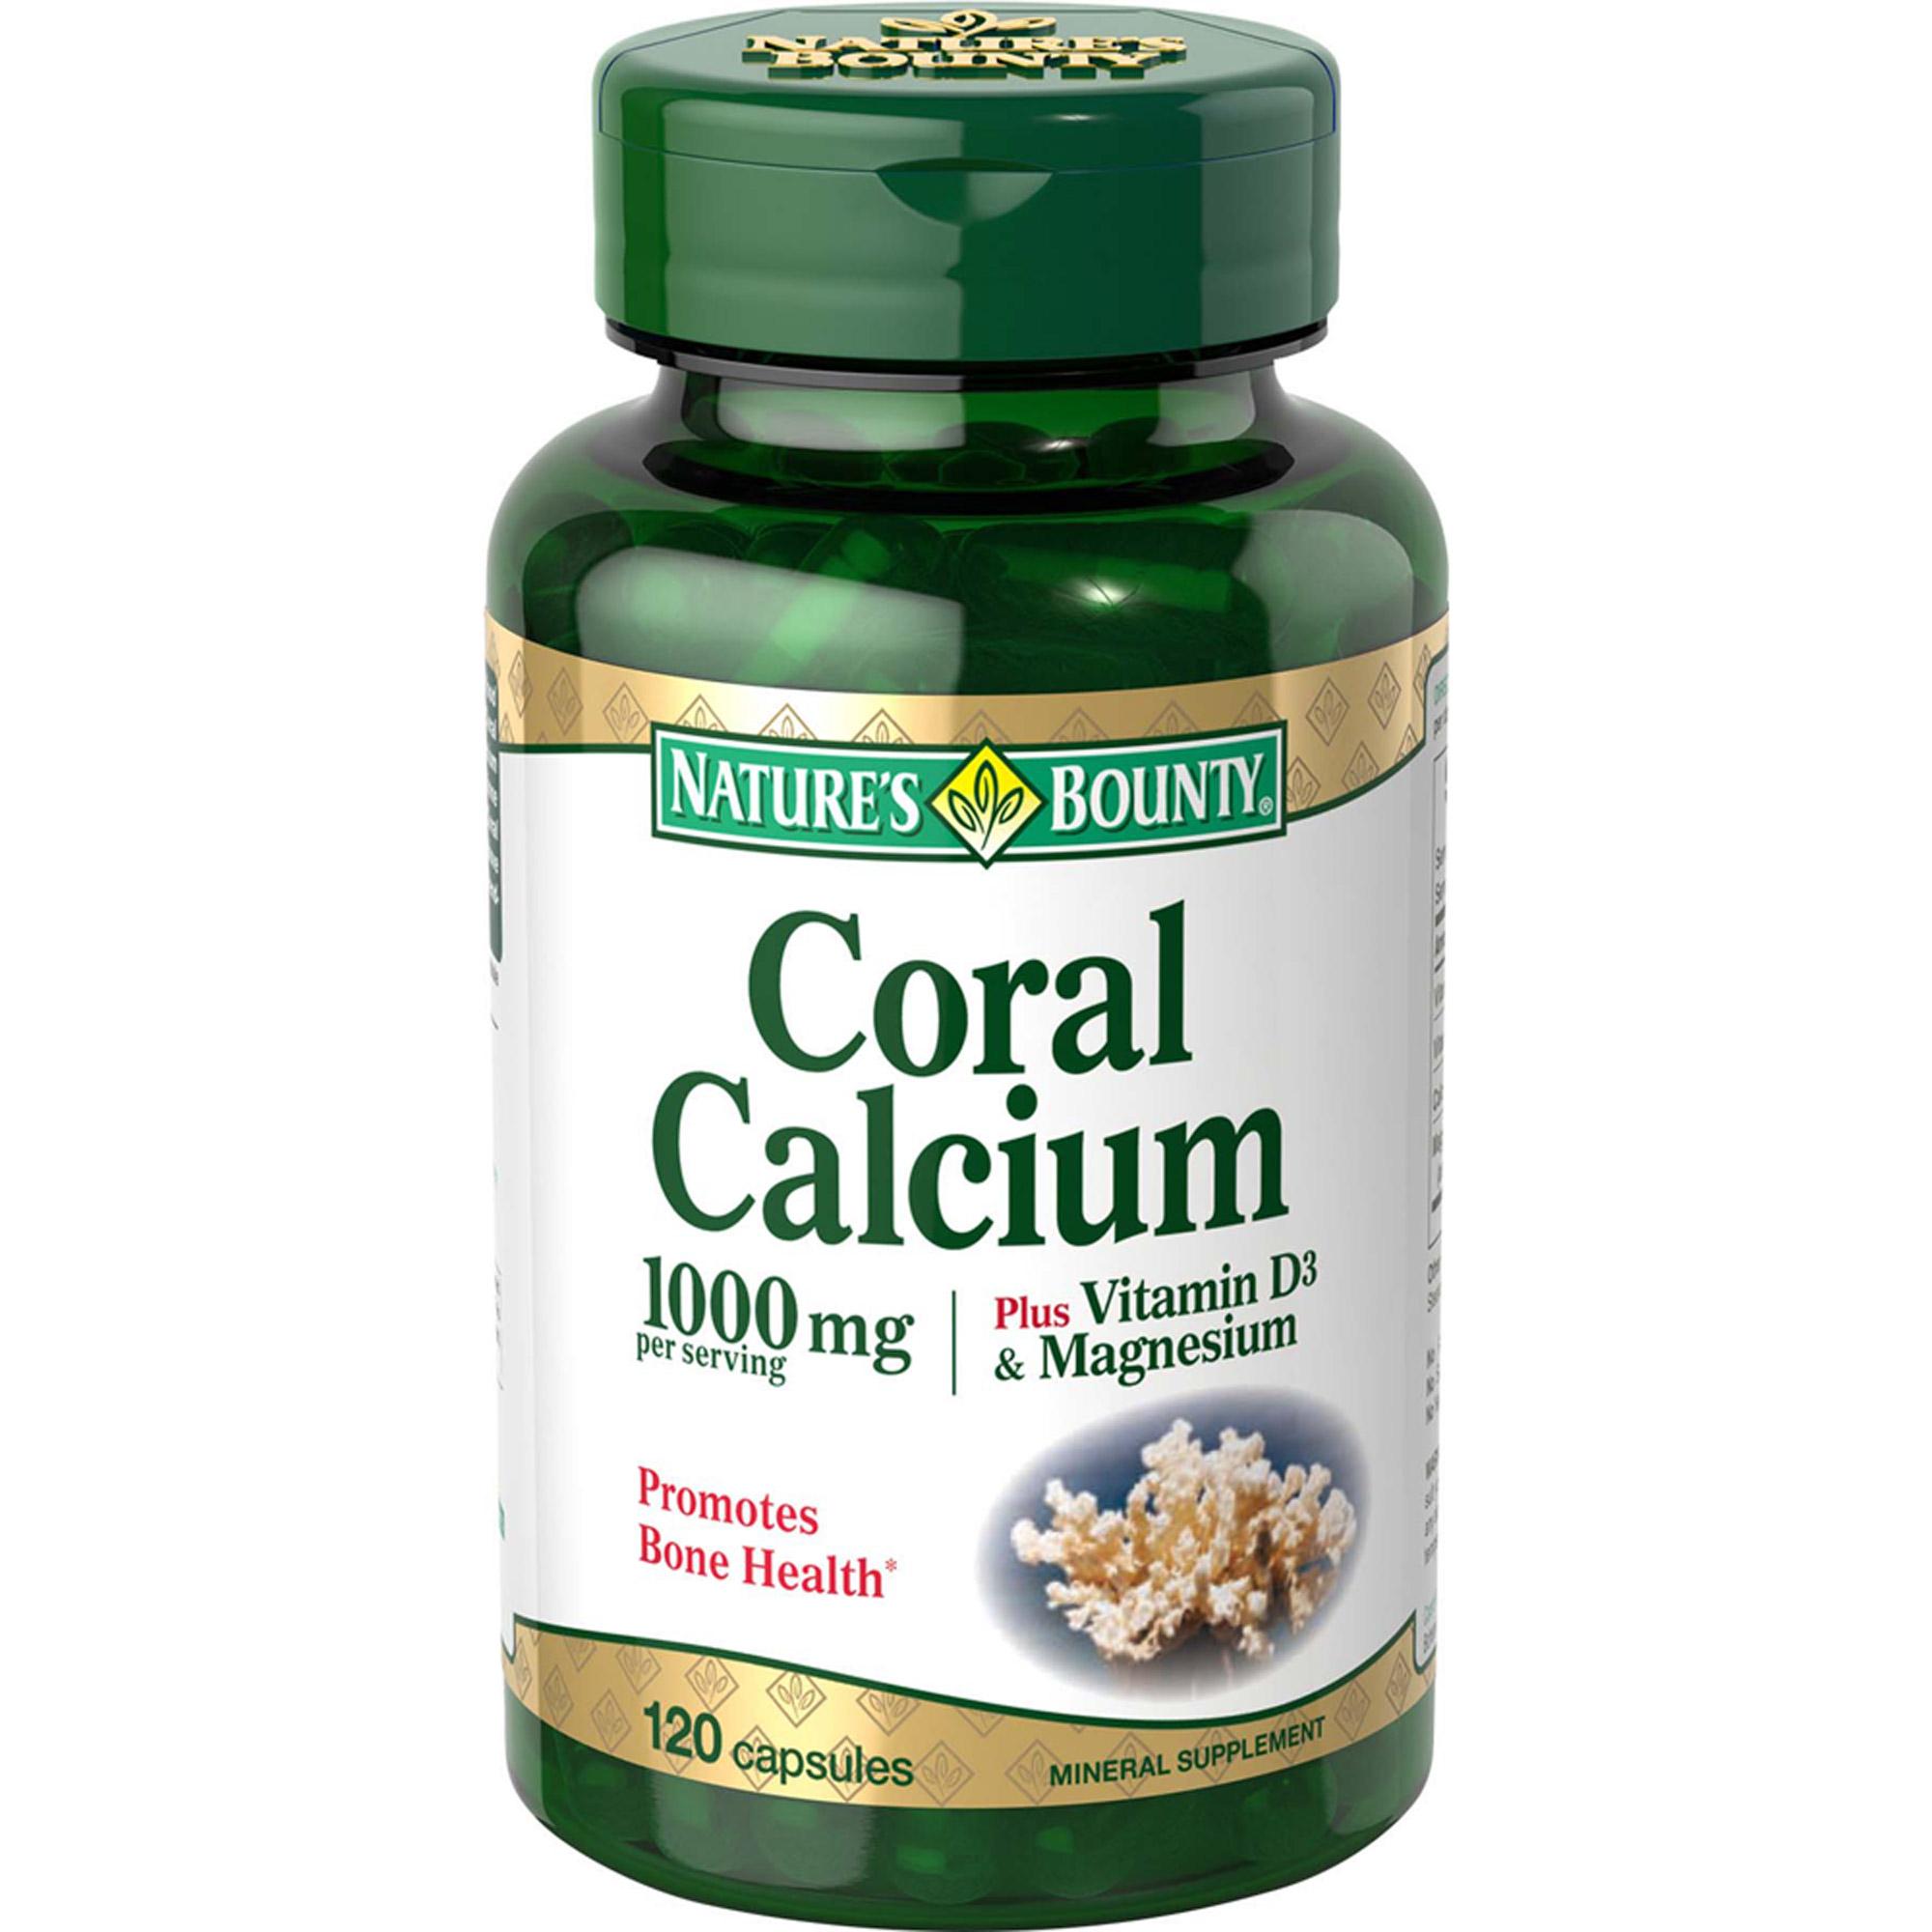 Natures bounty vitamins reviews - Nature S Bounty Coral Calcium Plus Vitamin D3 Magnesium 1000 Mg Per Serving 120 Capsules Walmart Com